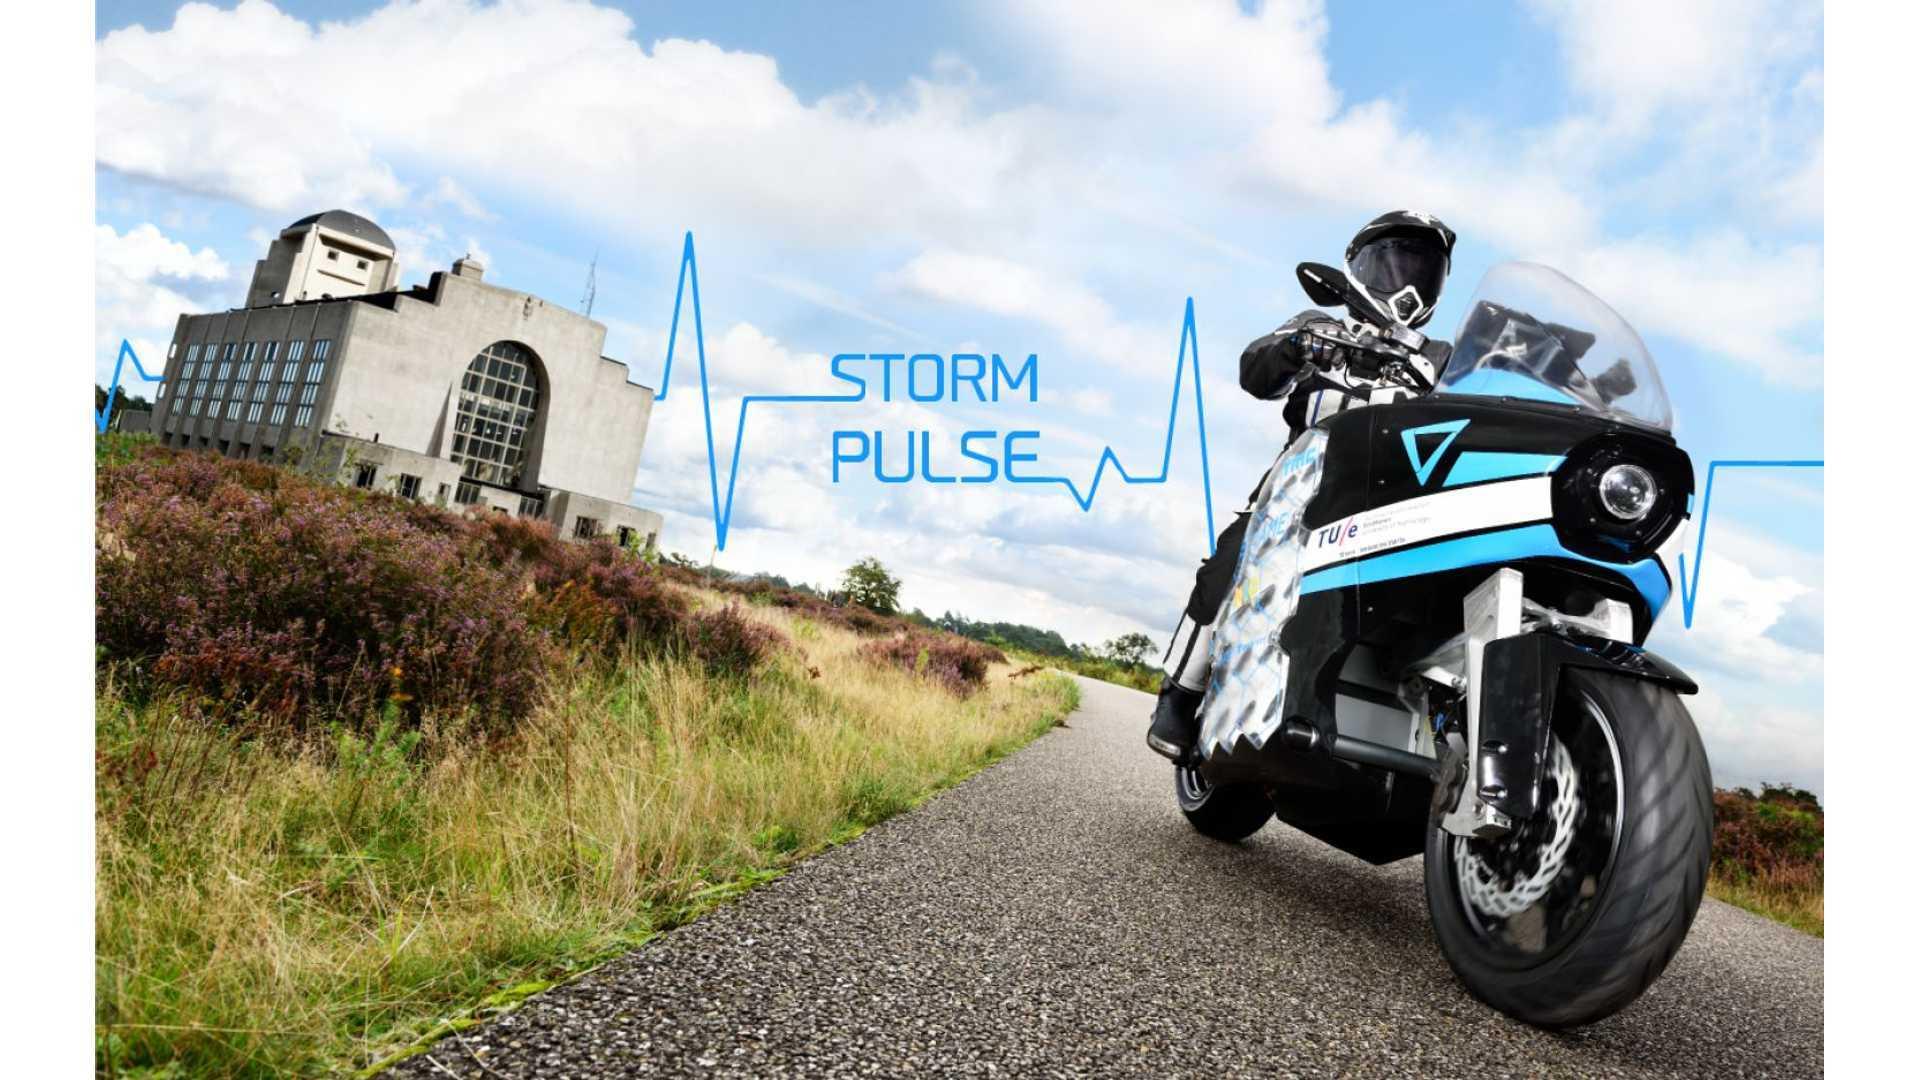 Meet The Long-Range Storm Pulse Electric Motorcycle